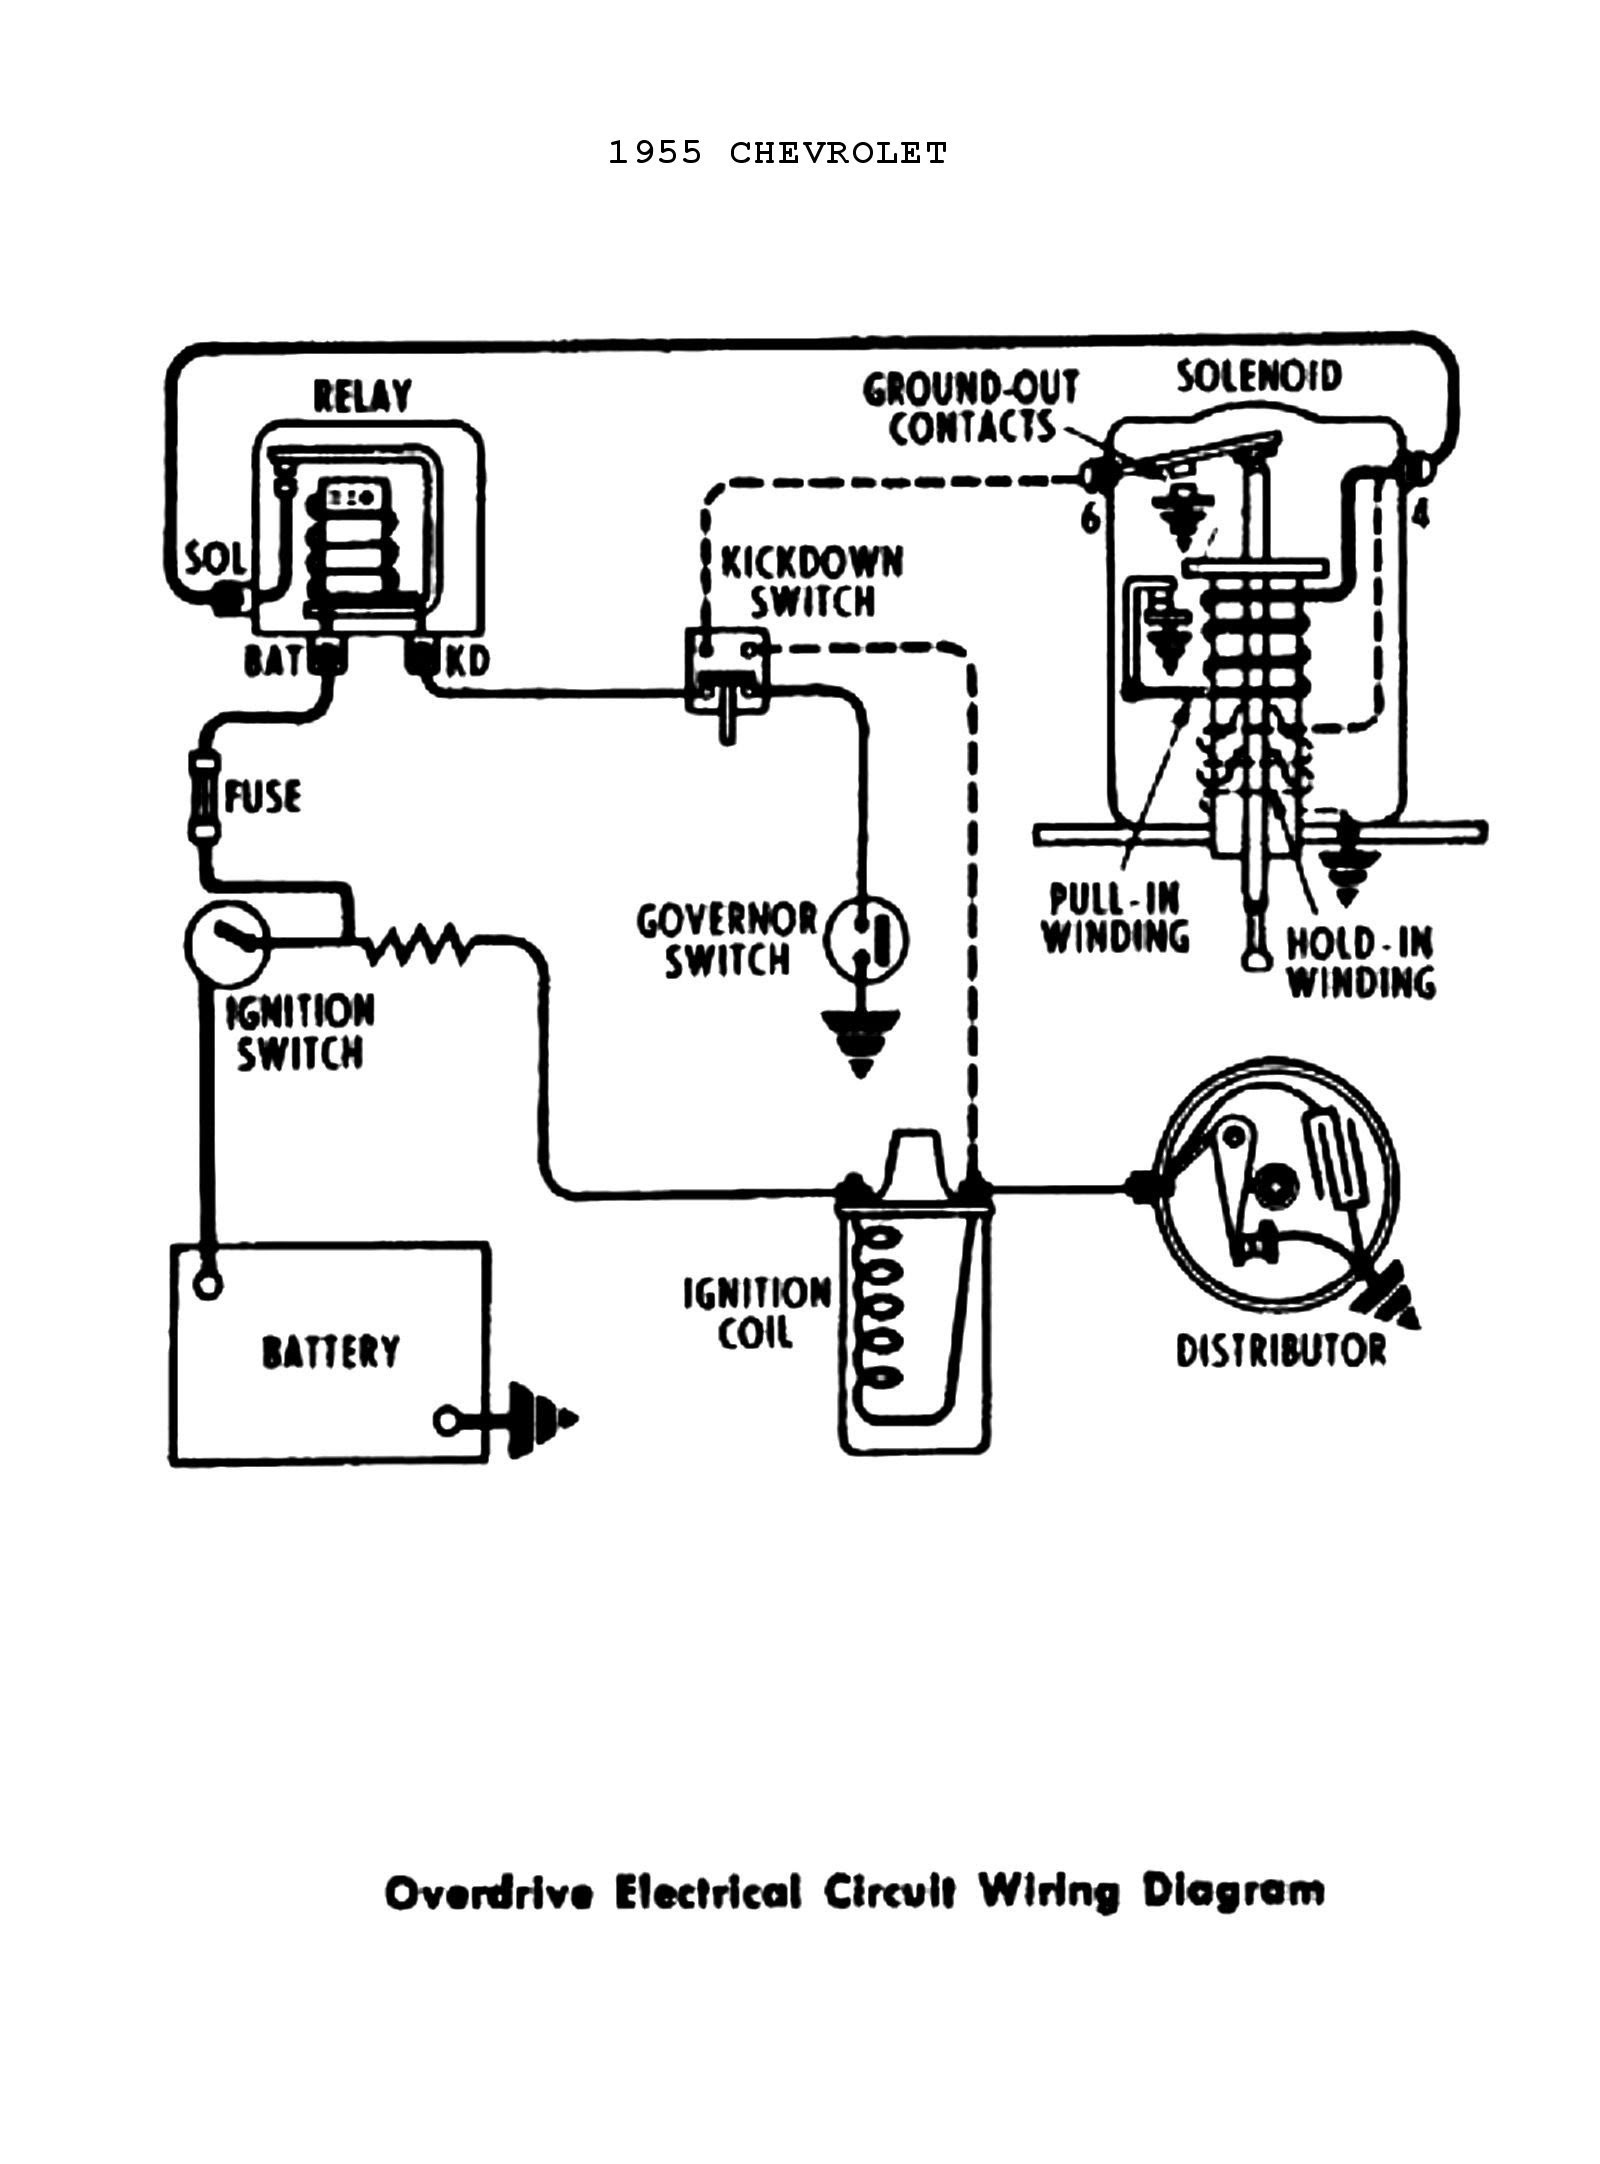 1951 chevy truck wiring diagram